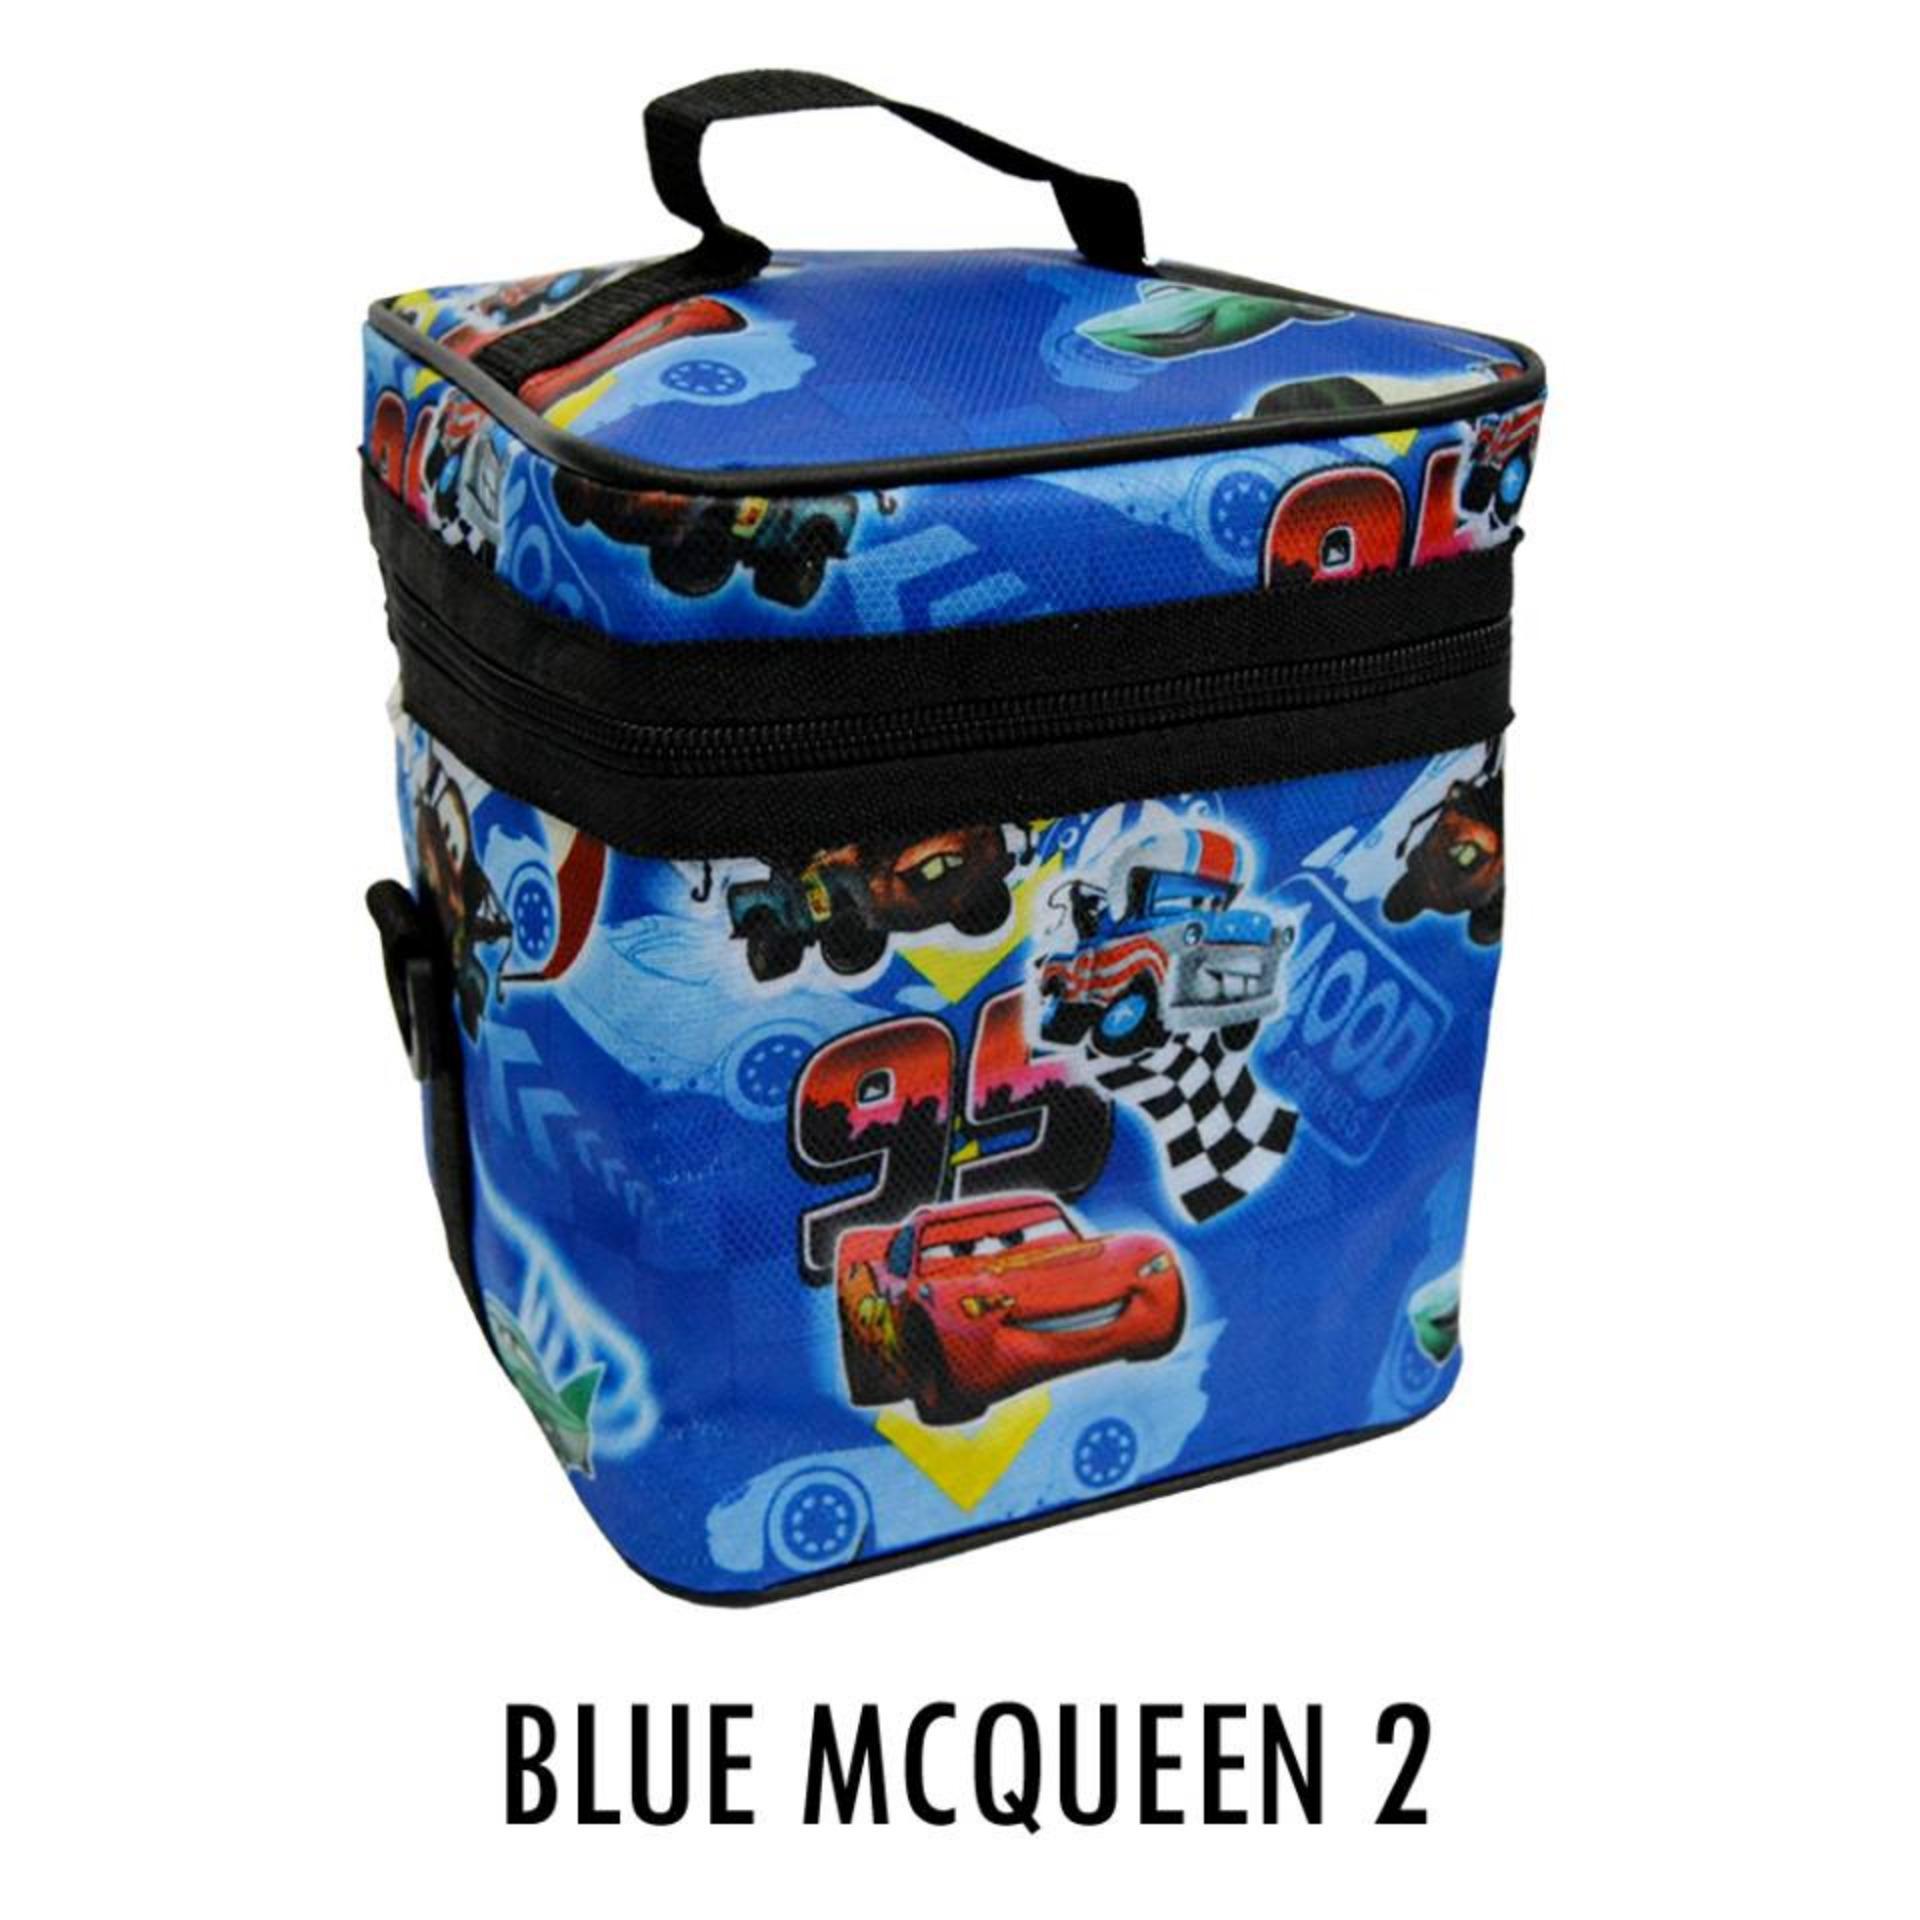 Harga Cooler Bag Ztwo Cars Tas Penyimpan Asip Atau Minuman Dingin Terbaik